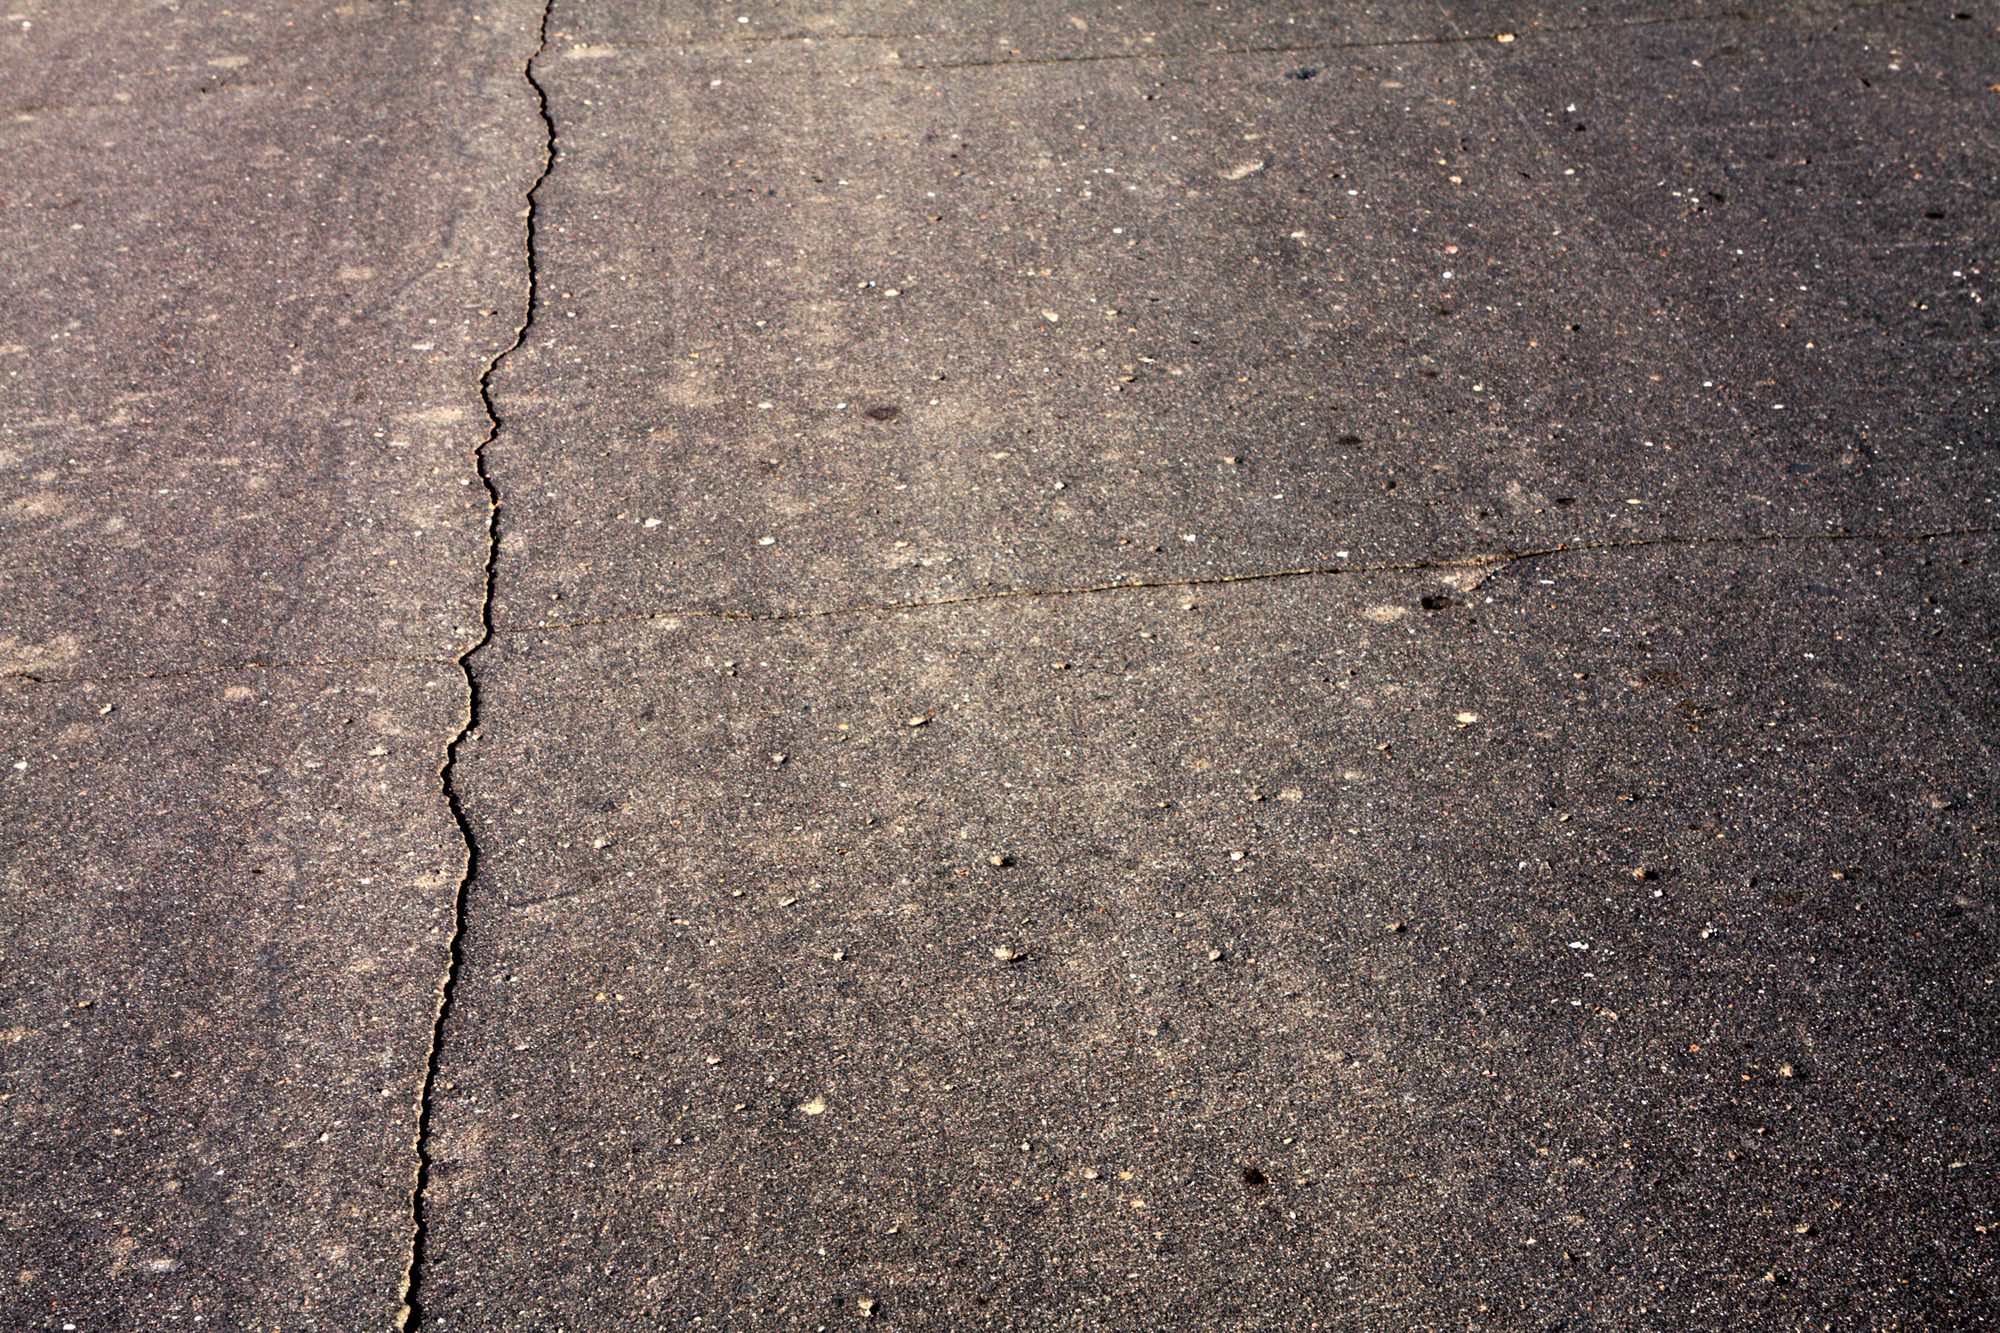 The Common Reasons Asphalt Cracks